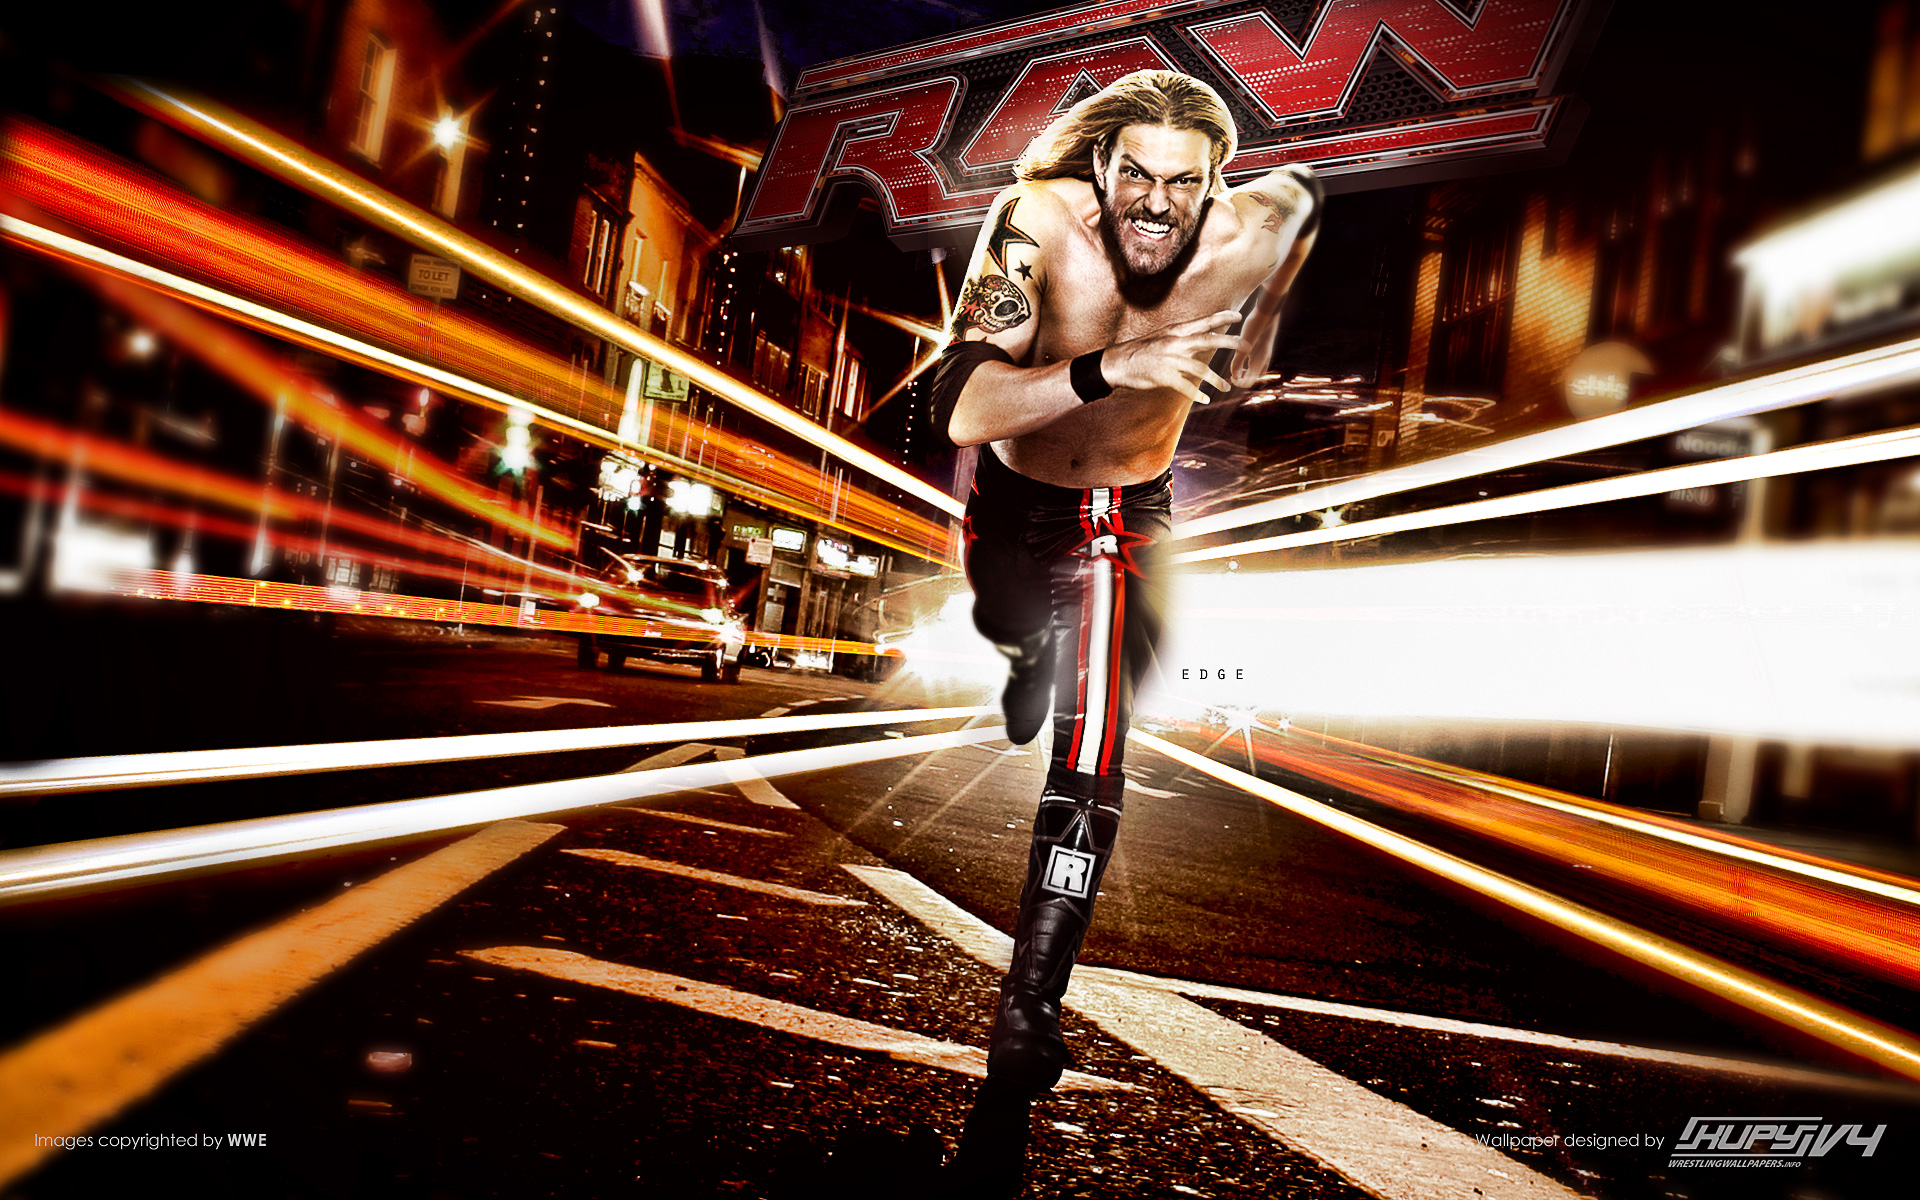 Raw Is Edge Wrestling Wallpaper Kupy Wrestling Wallpapers The